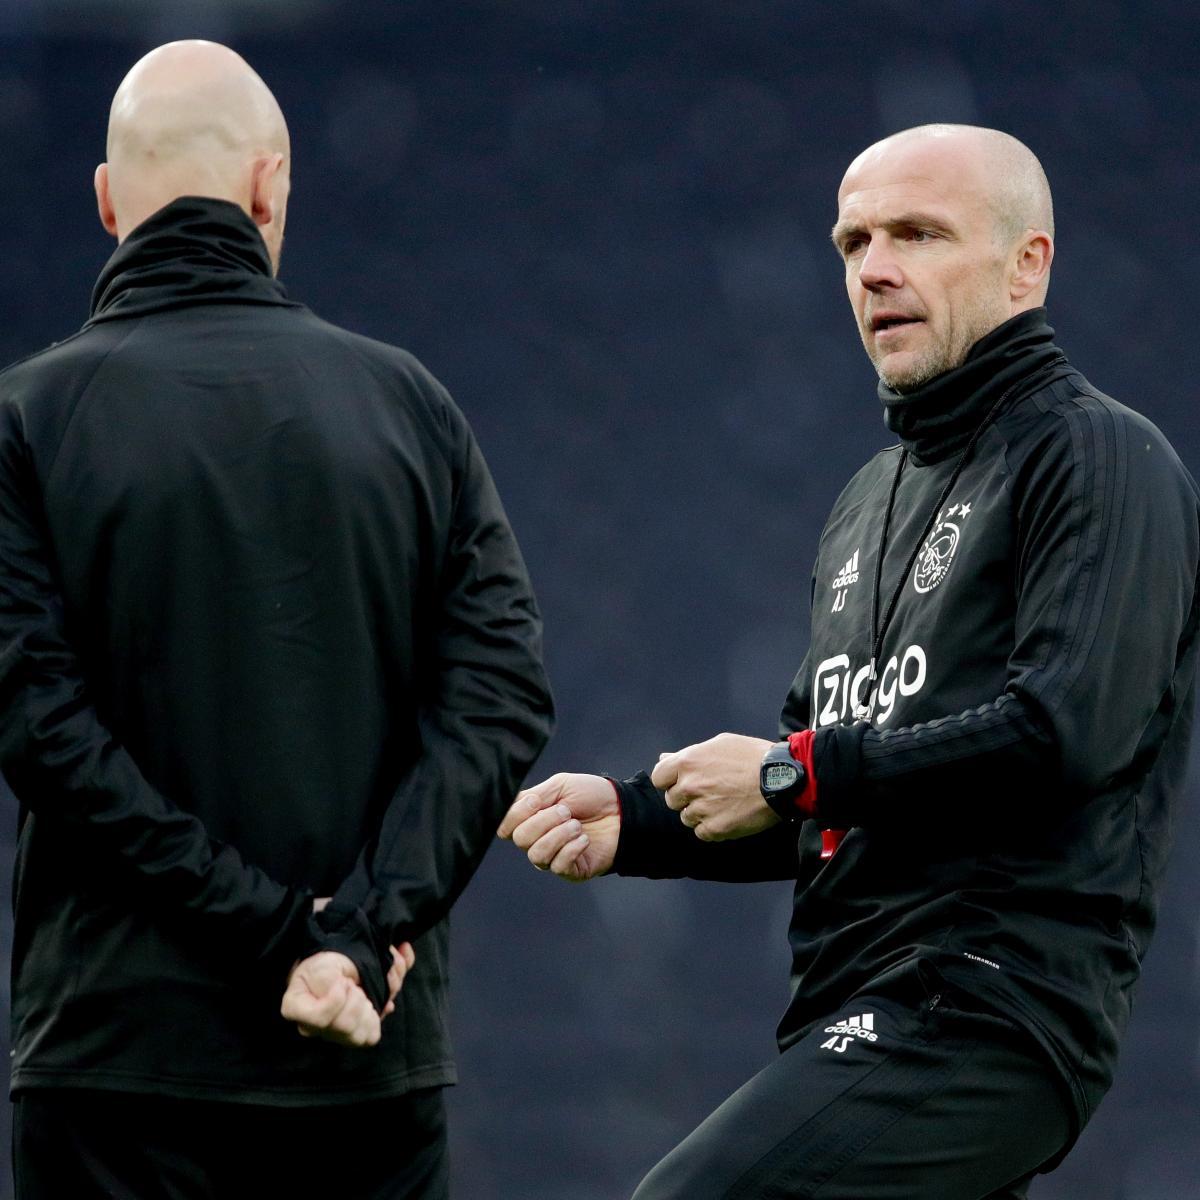 Ajax Boss Erik Ten Hag Slams PL Pay Disparity After